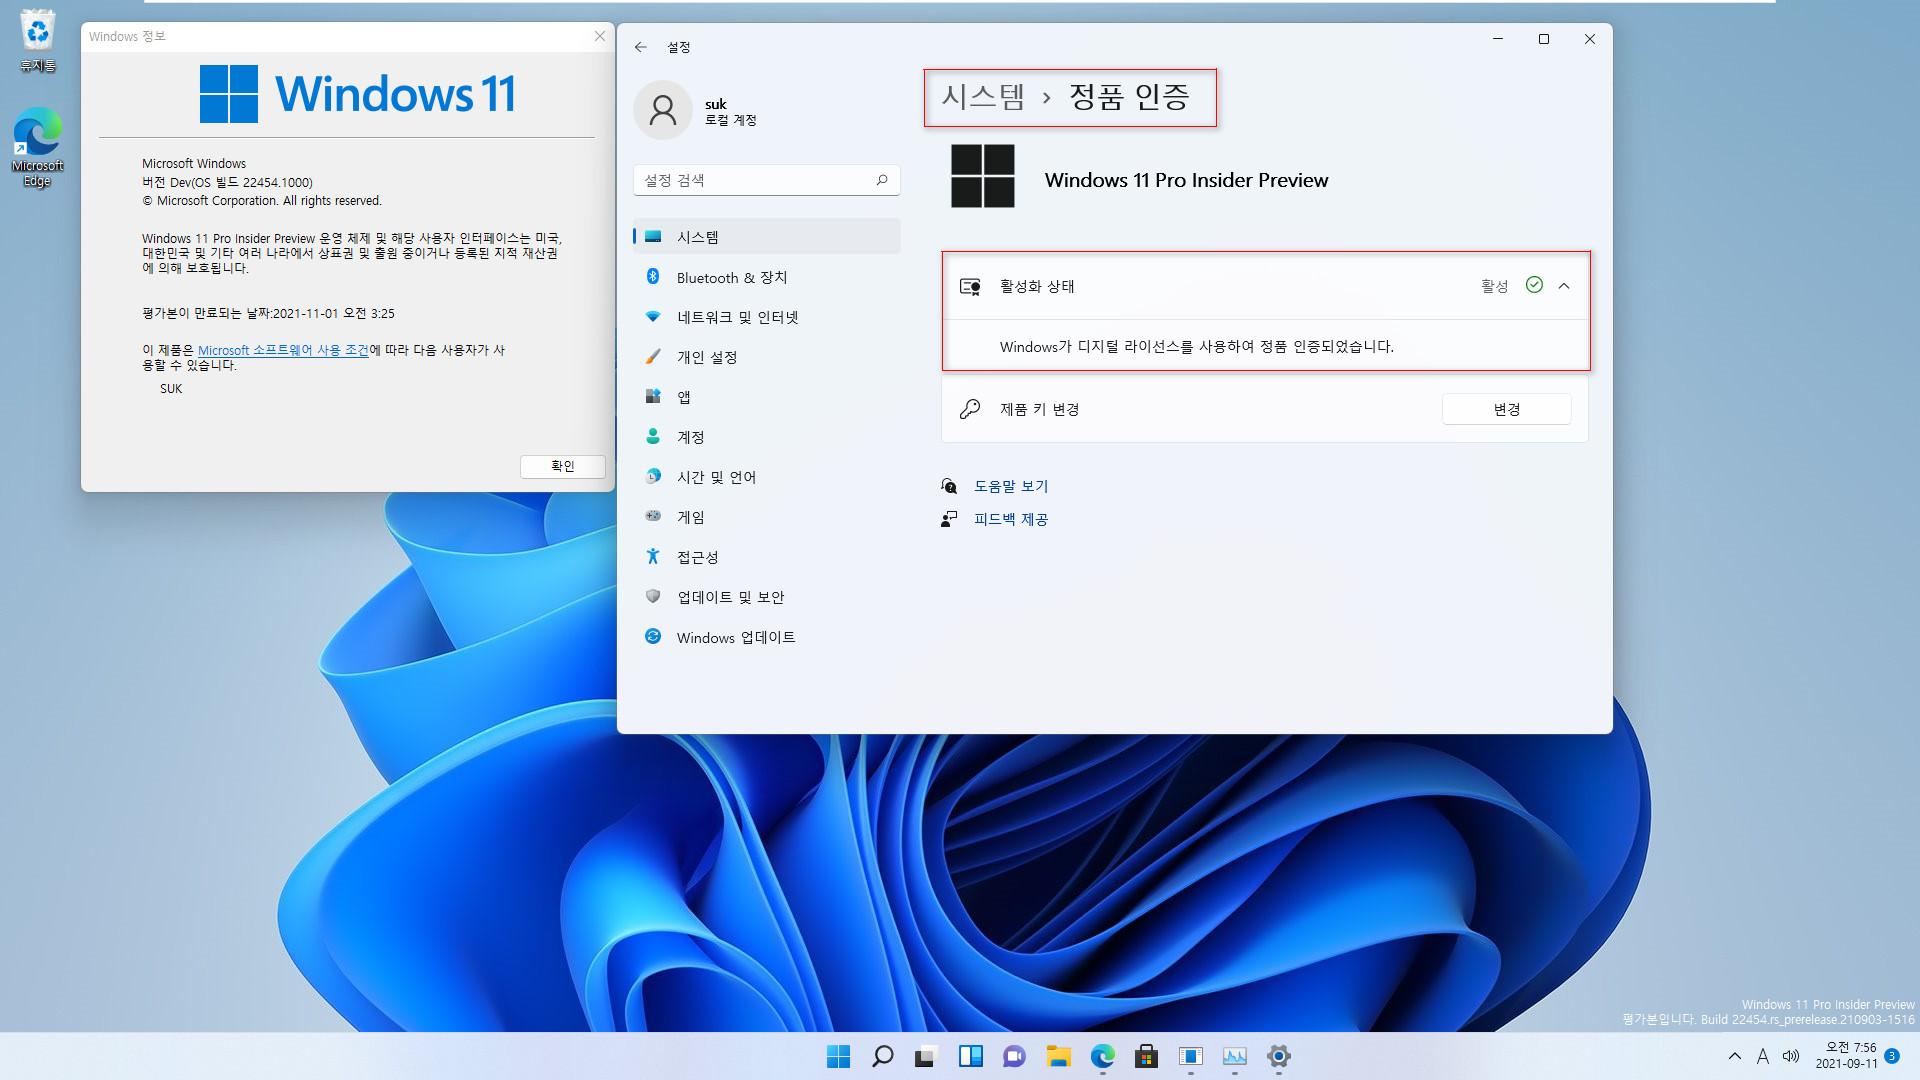 Windows 11 인사이더 프리뷰 - 버전 Dev (OS 빌드 22454.1000) - 평가본은 평가판과 다르고 인사이더 프리뷰 윈도우라는 의미이고 정품인증과 관계없습니다 2021-09-11_075659.jpg